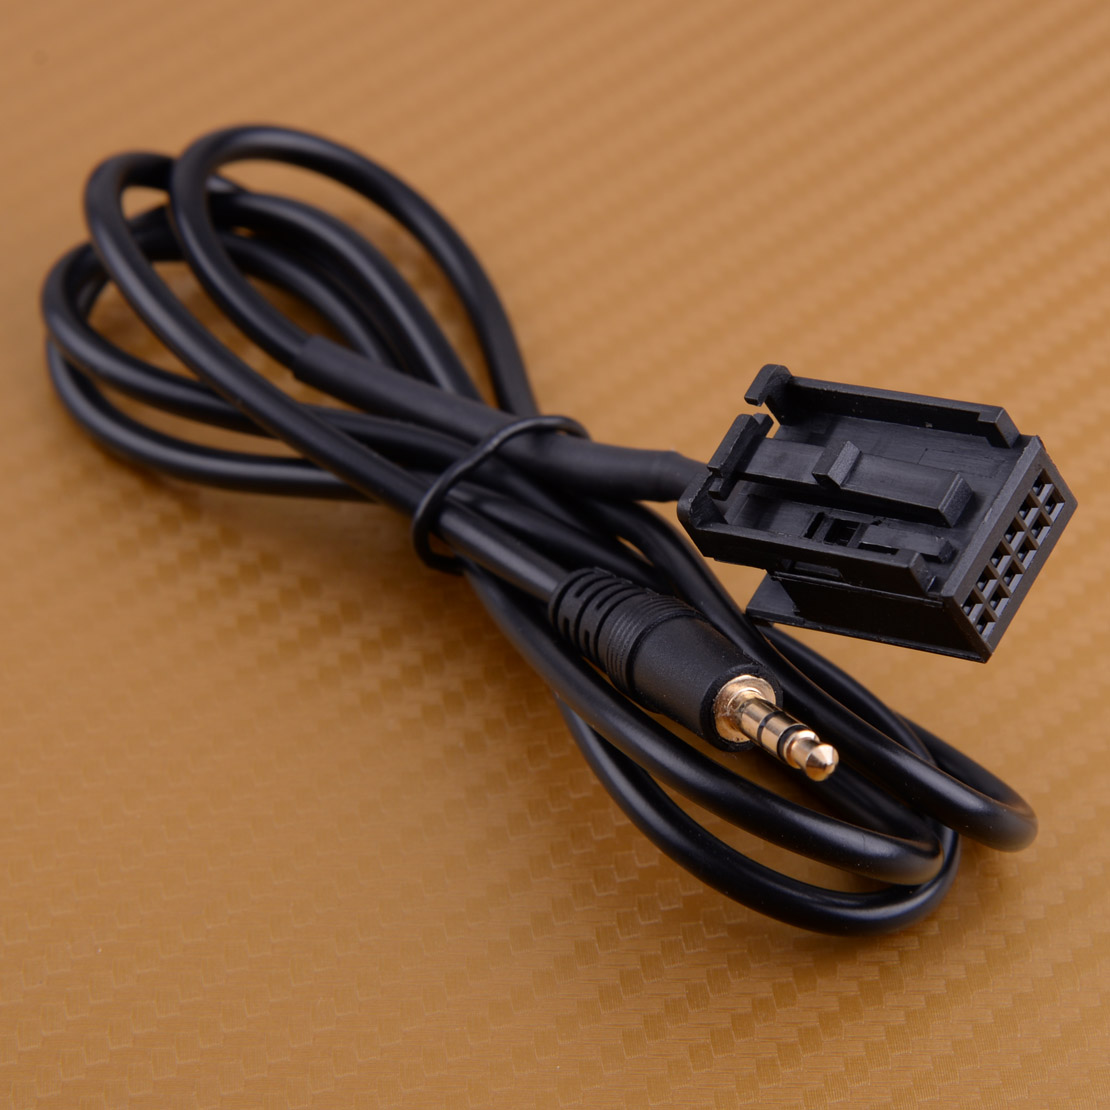 Vauxhall Meriva CD Changer Aux Input Adaptor Audio Interface 3.5mm Ipod Jack